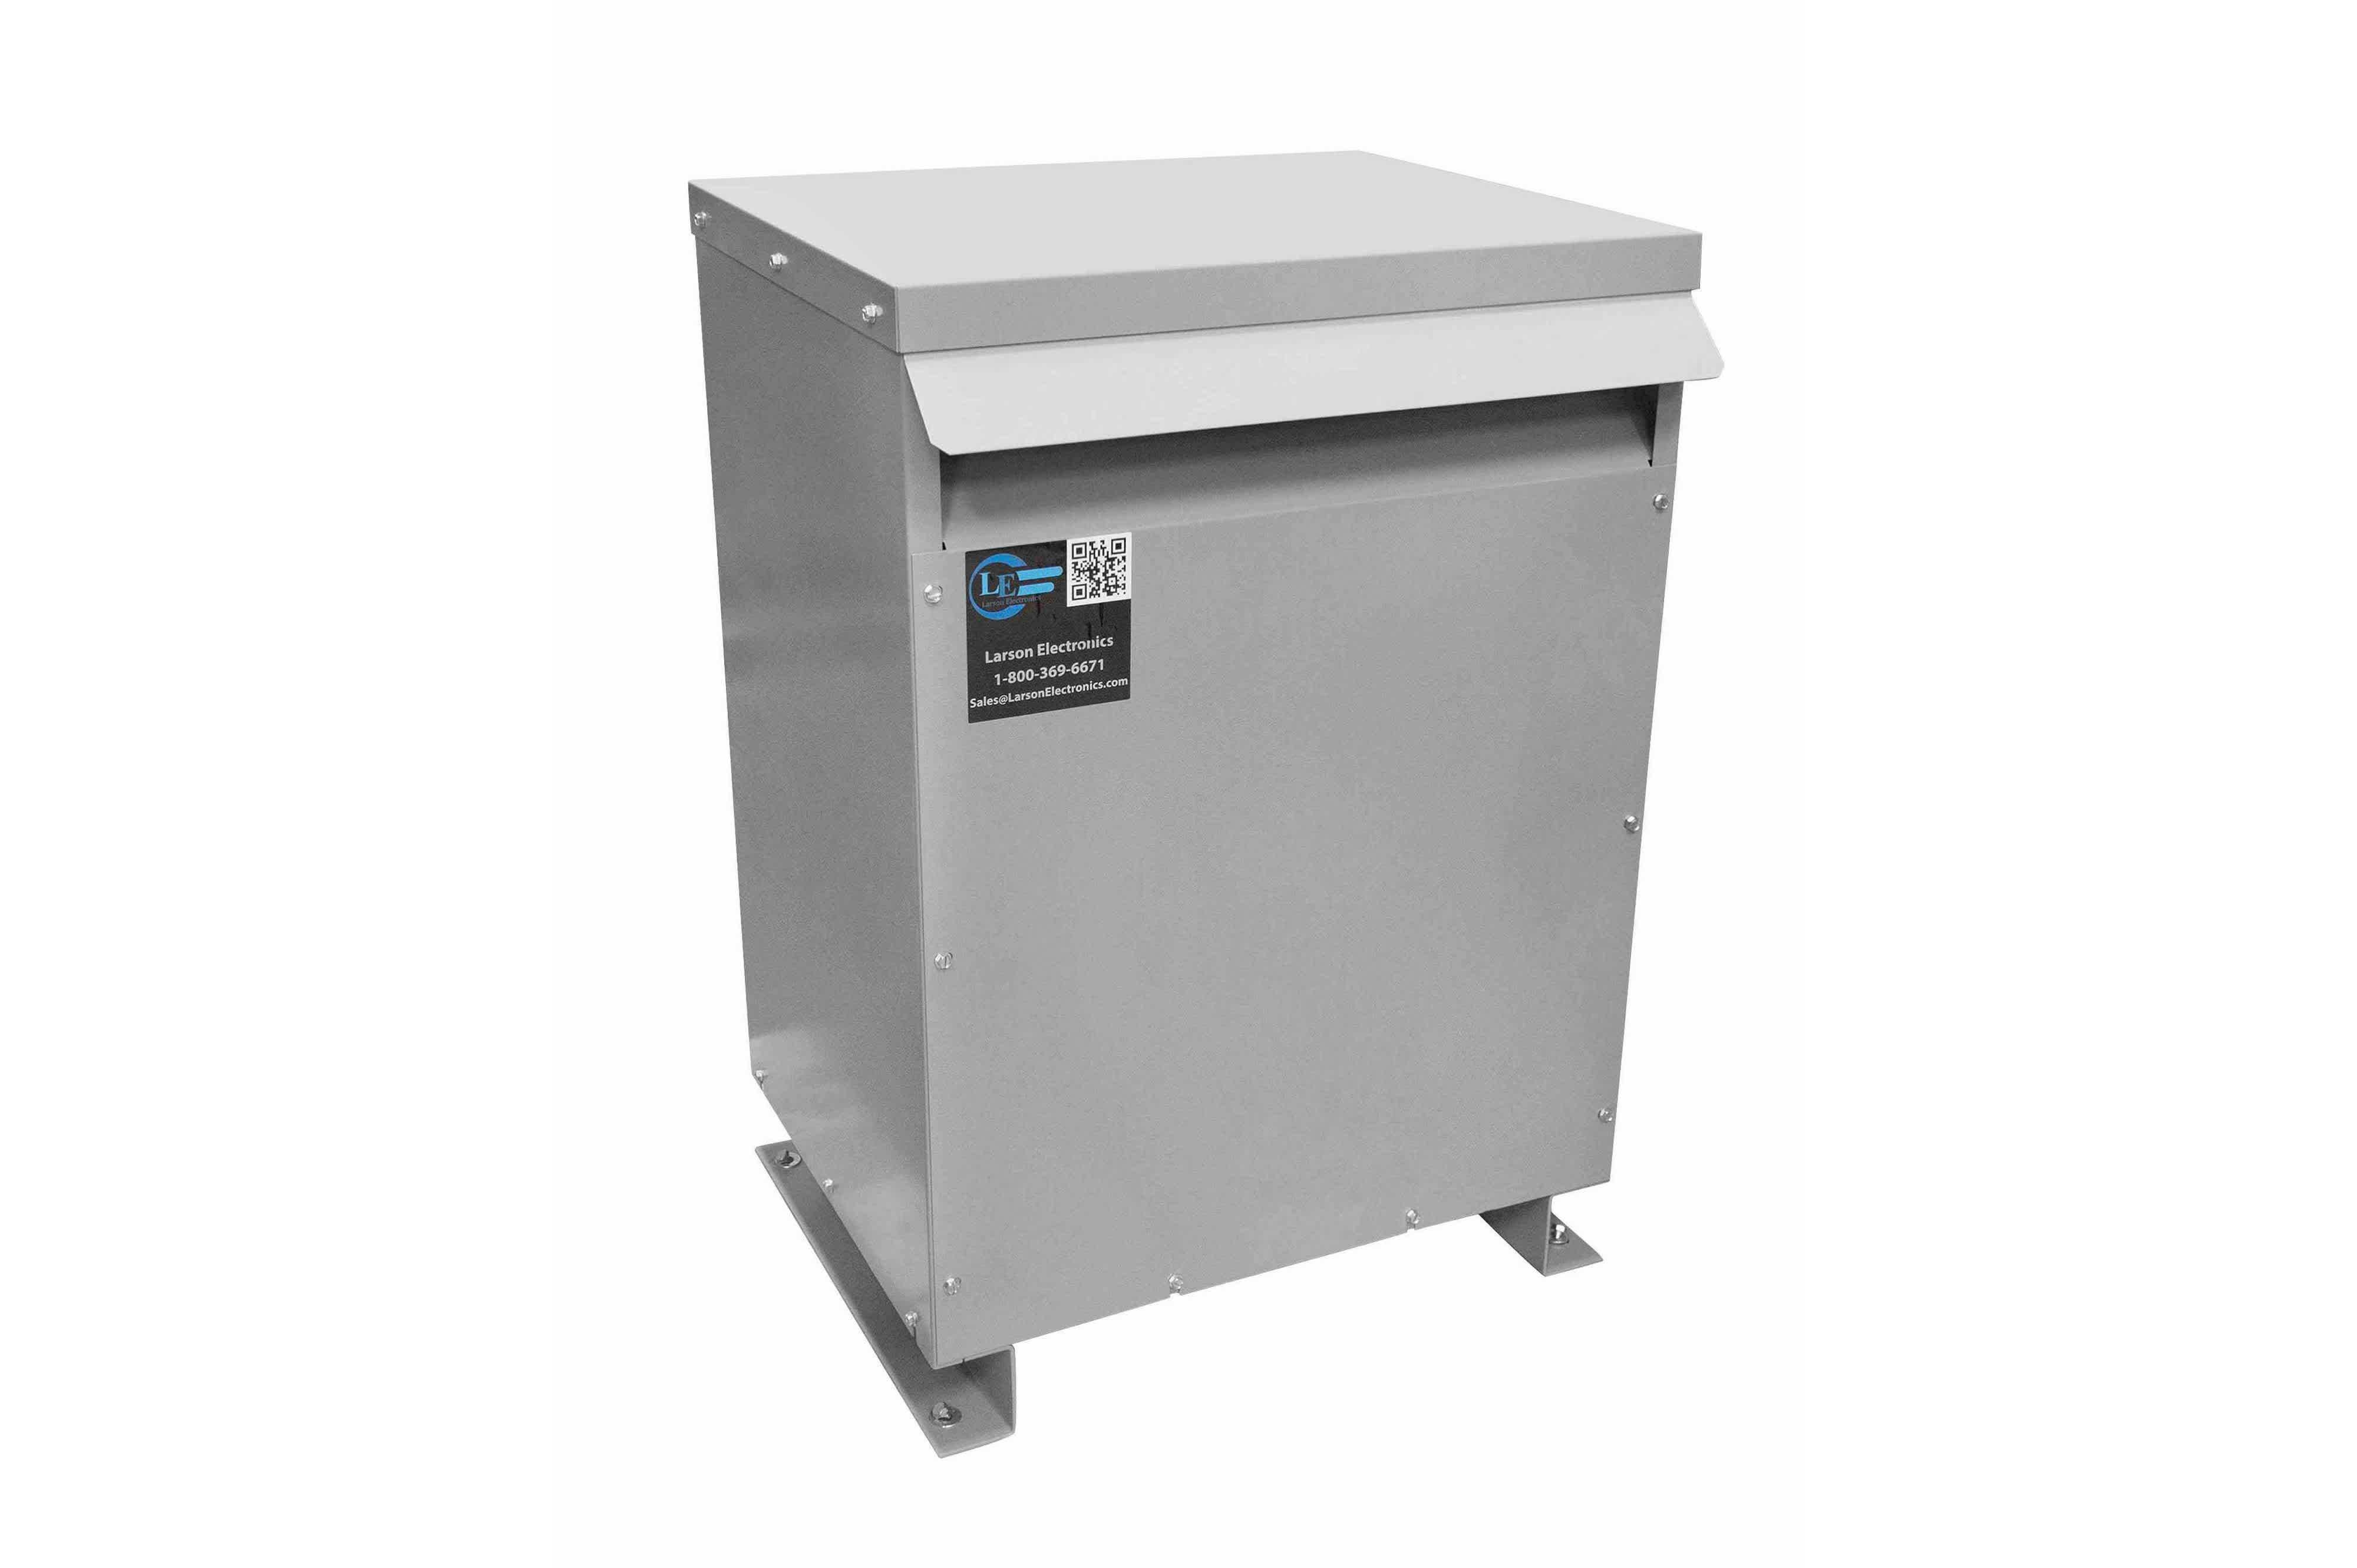 750 kVA 3PH DOE Transformer, 380V Delta Primary, 480Y/277 Wye-N Secondary, N3R, Ventilated, 60 Hz